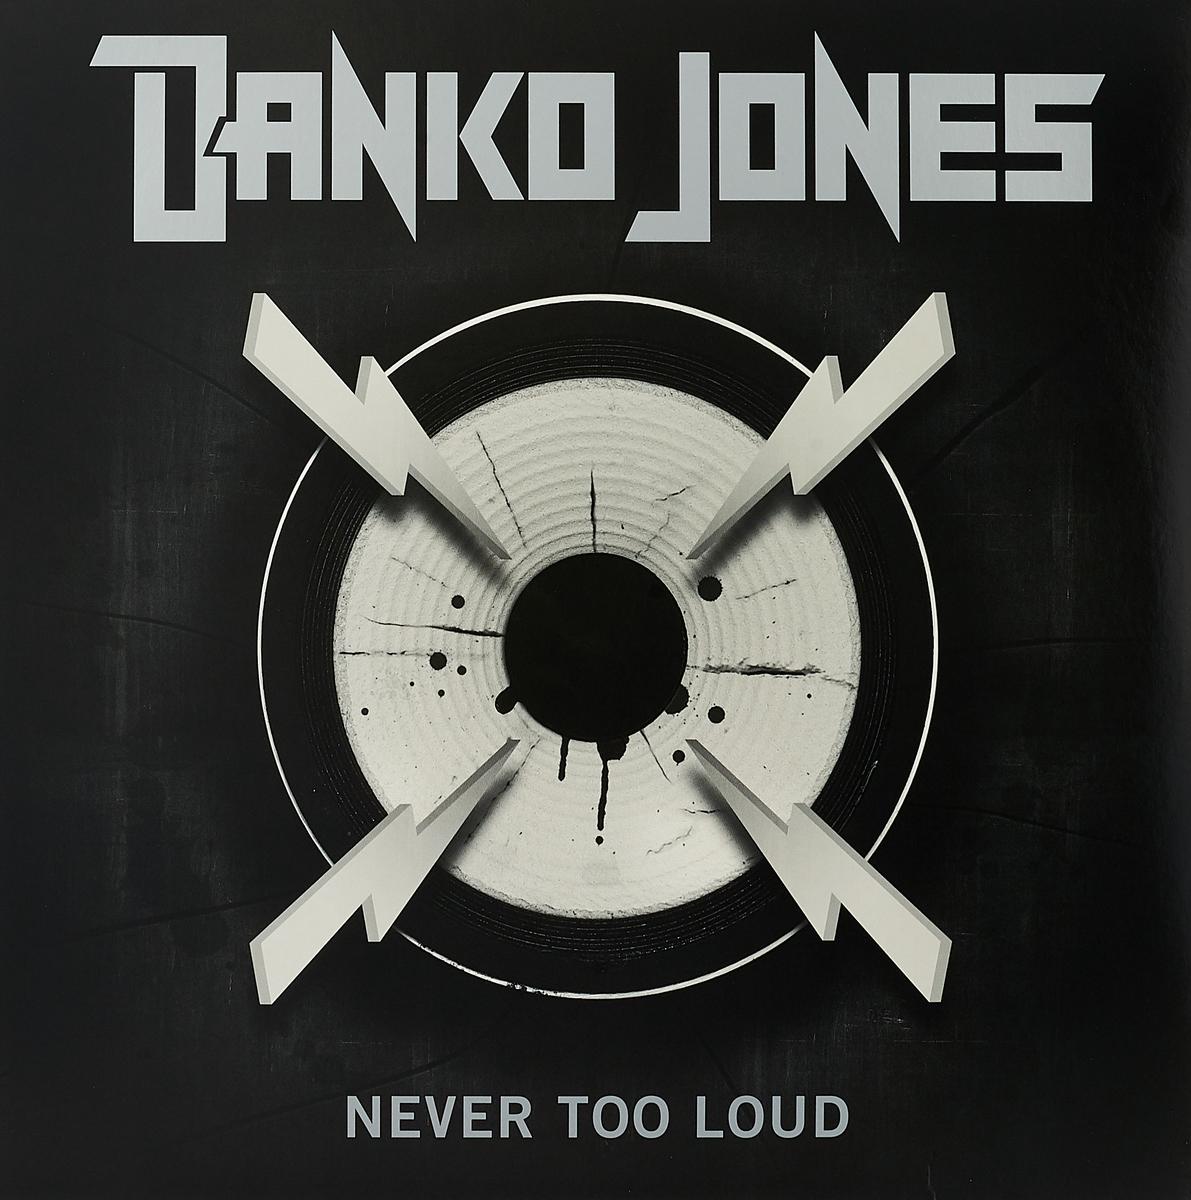 Фото - Danko Jones Danko Jones. Never Too Loud (LP) james danko suzuki every van electrical service manual db52v da52v